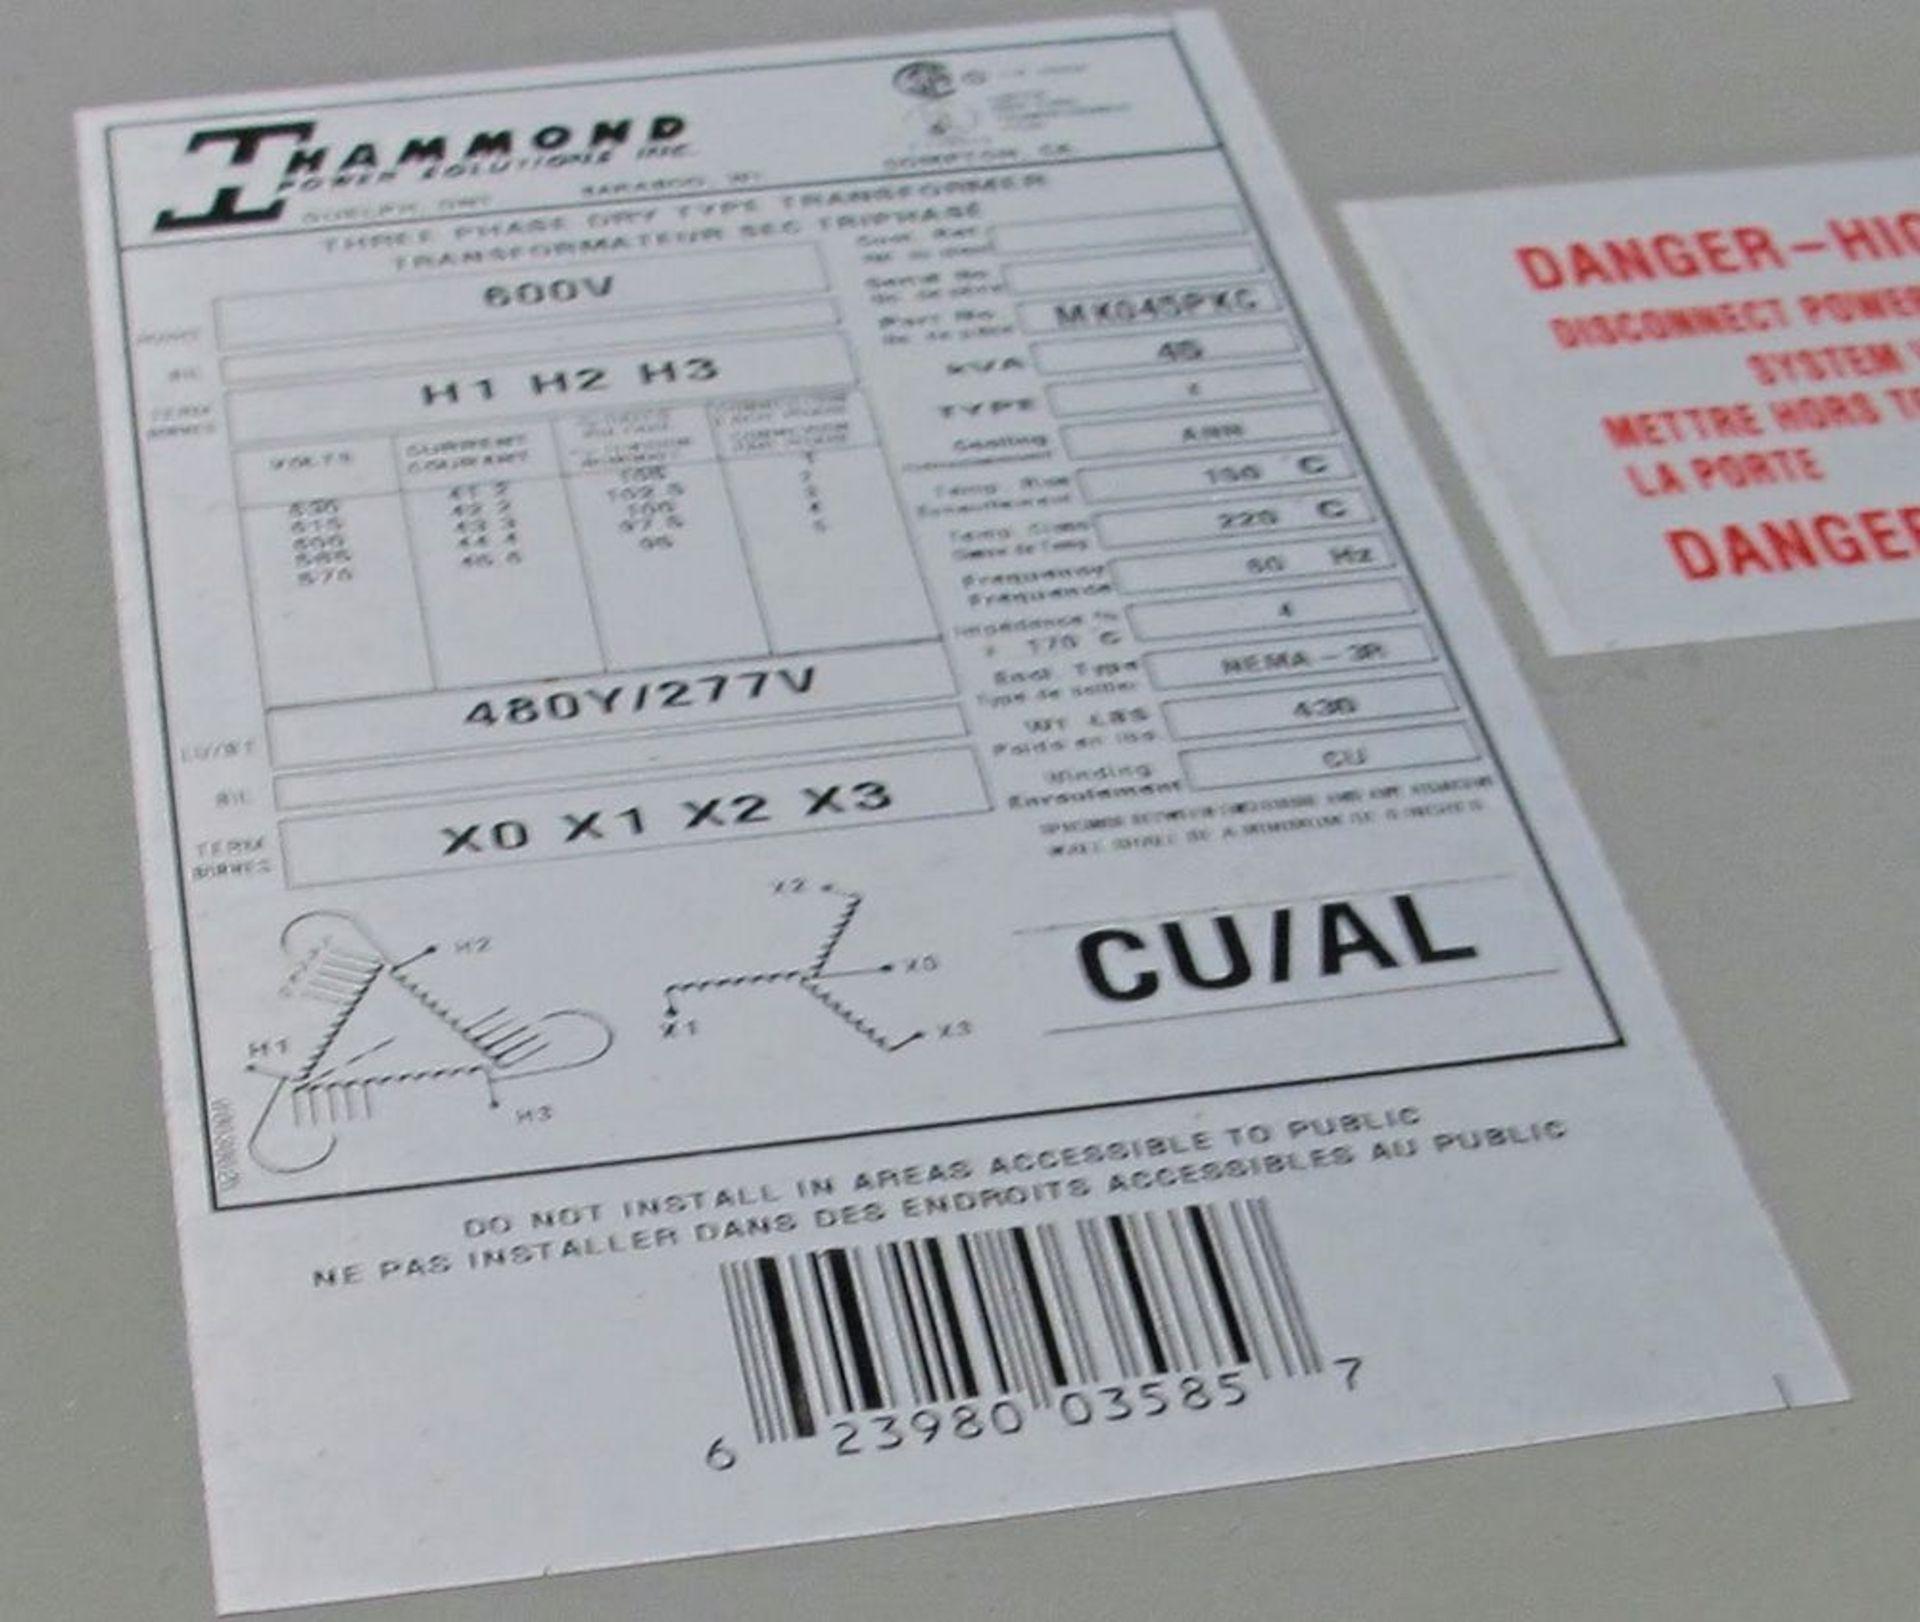 Lot 17 - 45KVA TRANSFORMER, 600V PRIMARY, 480/277 SECONDARY